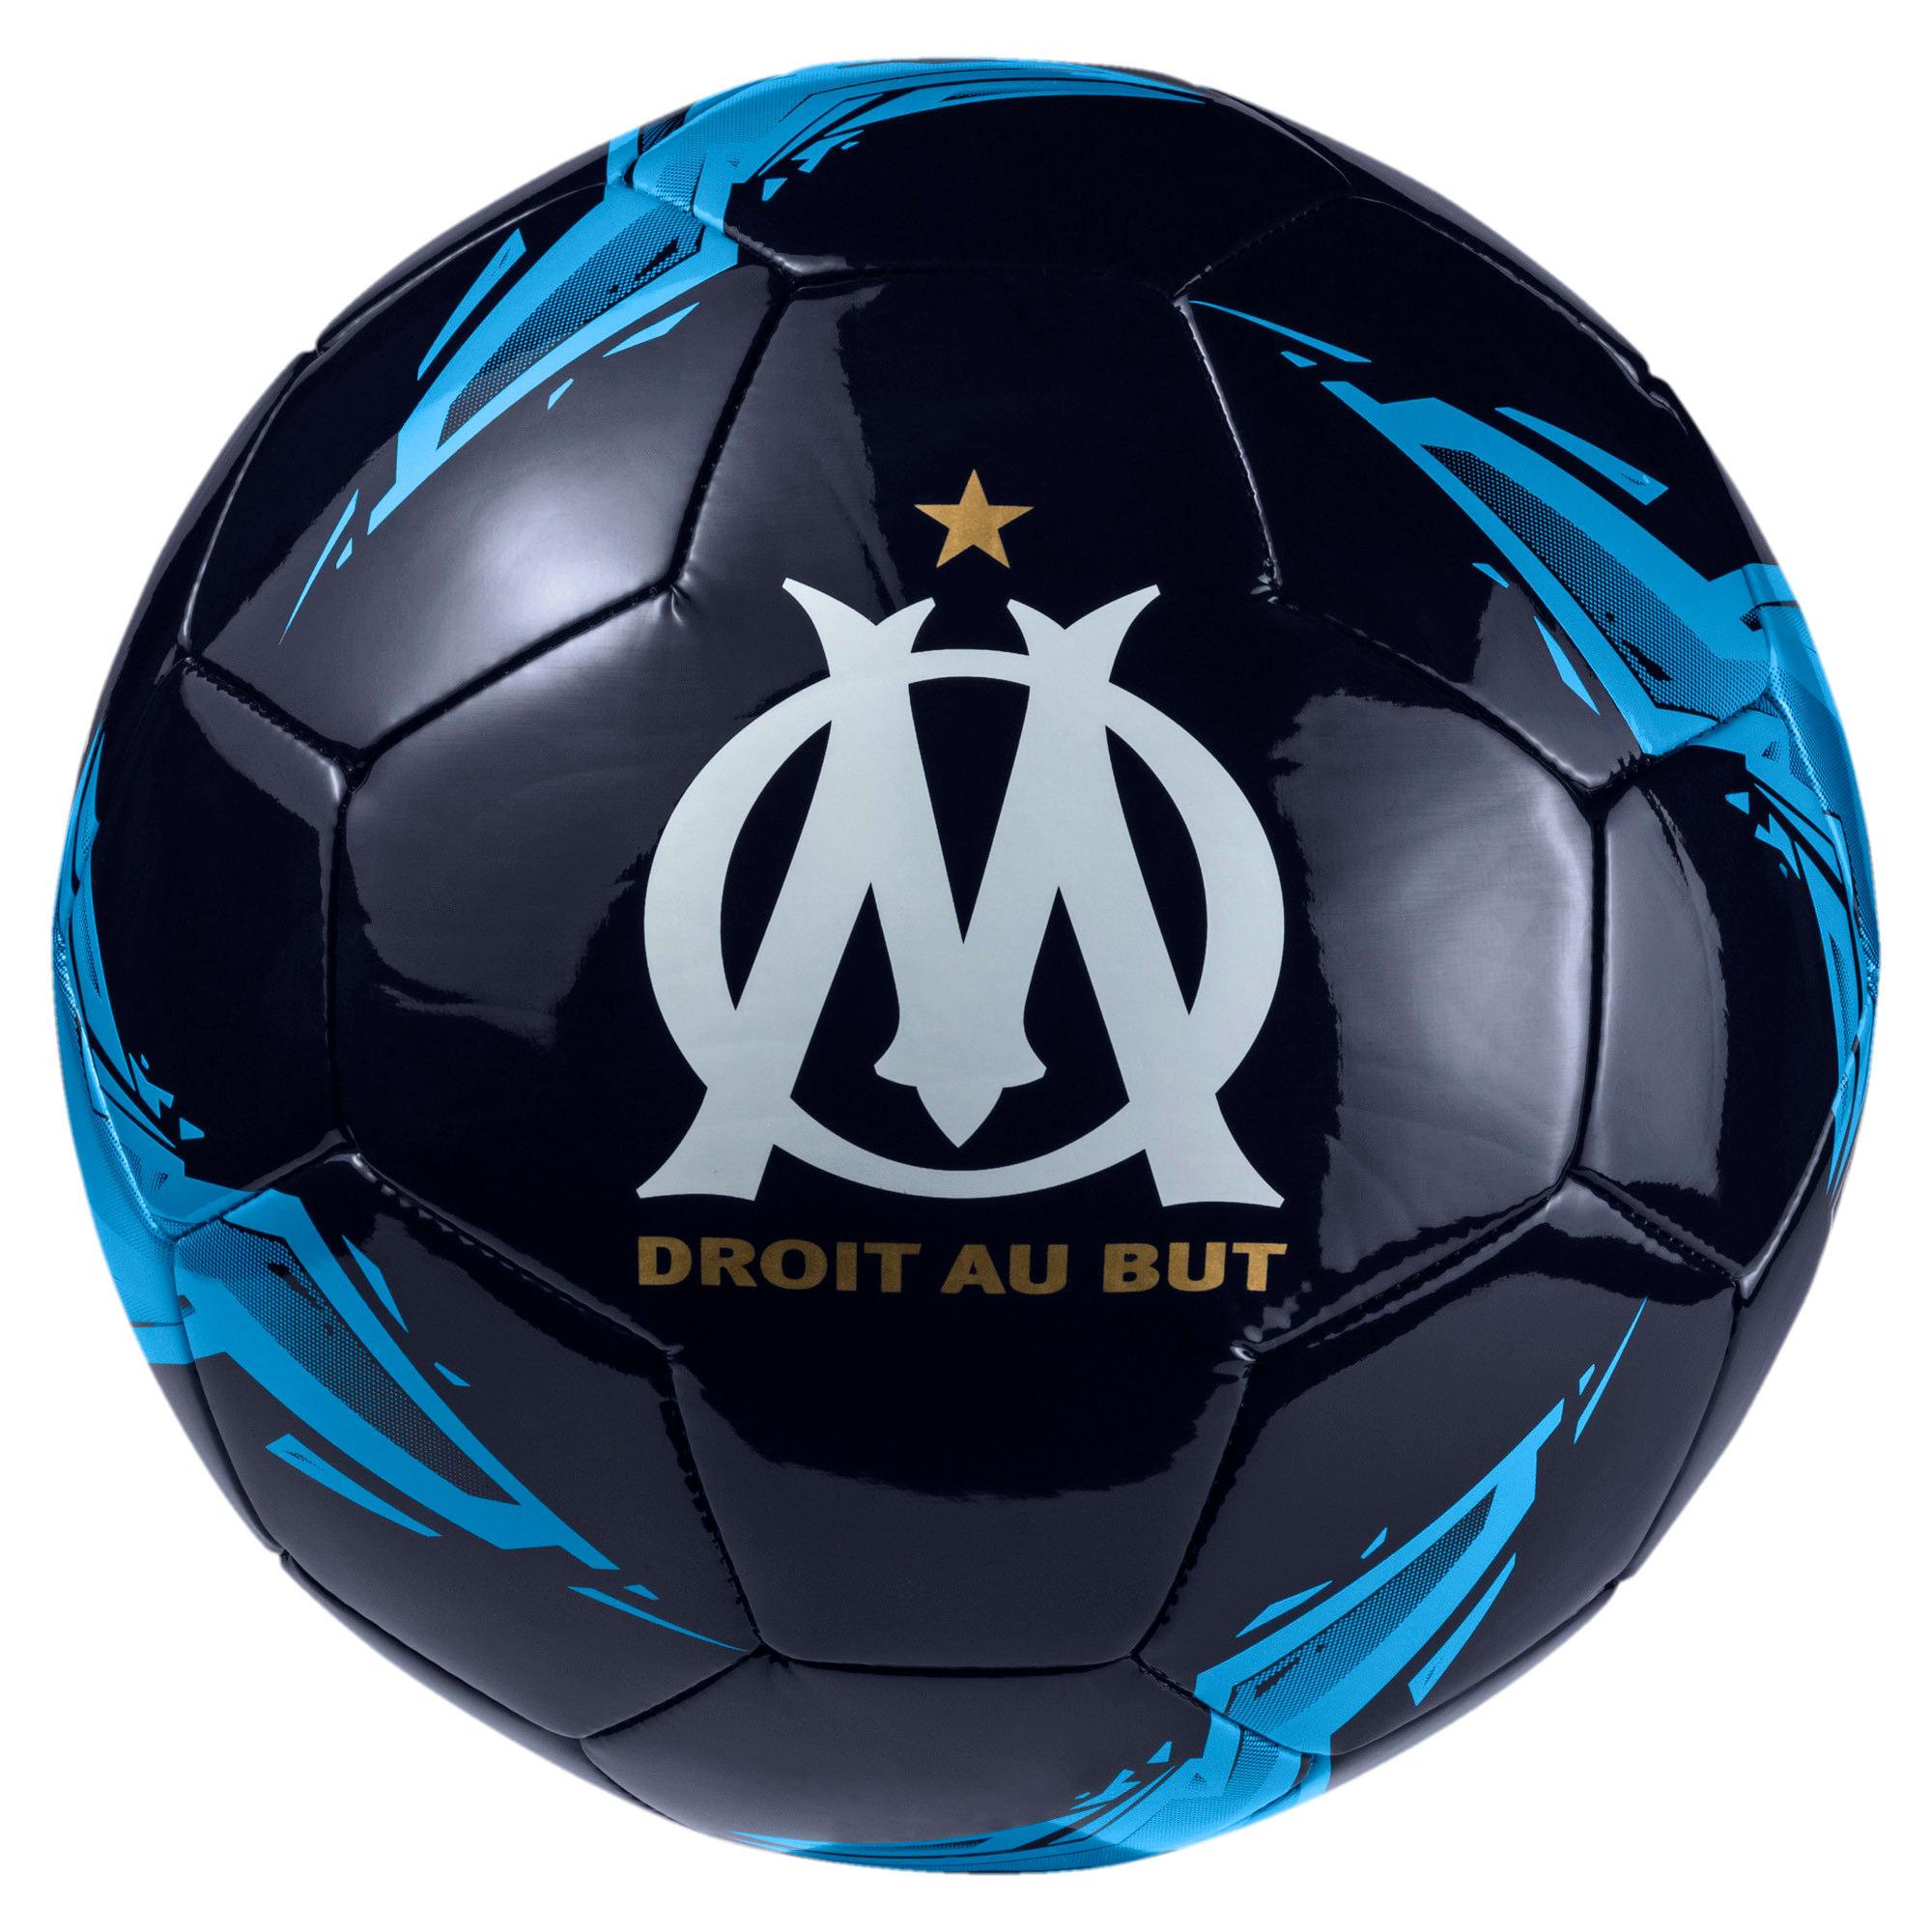 Thumbnail 1 of Olympique de Marseille Fan Ball, Peacoat-Bleu Azur, medium